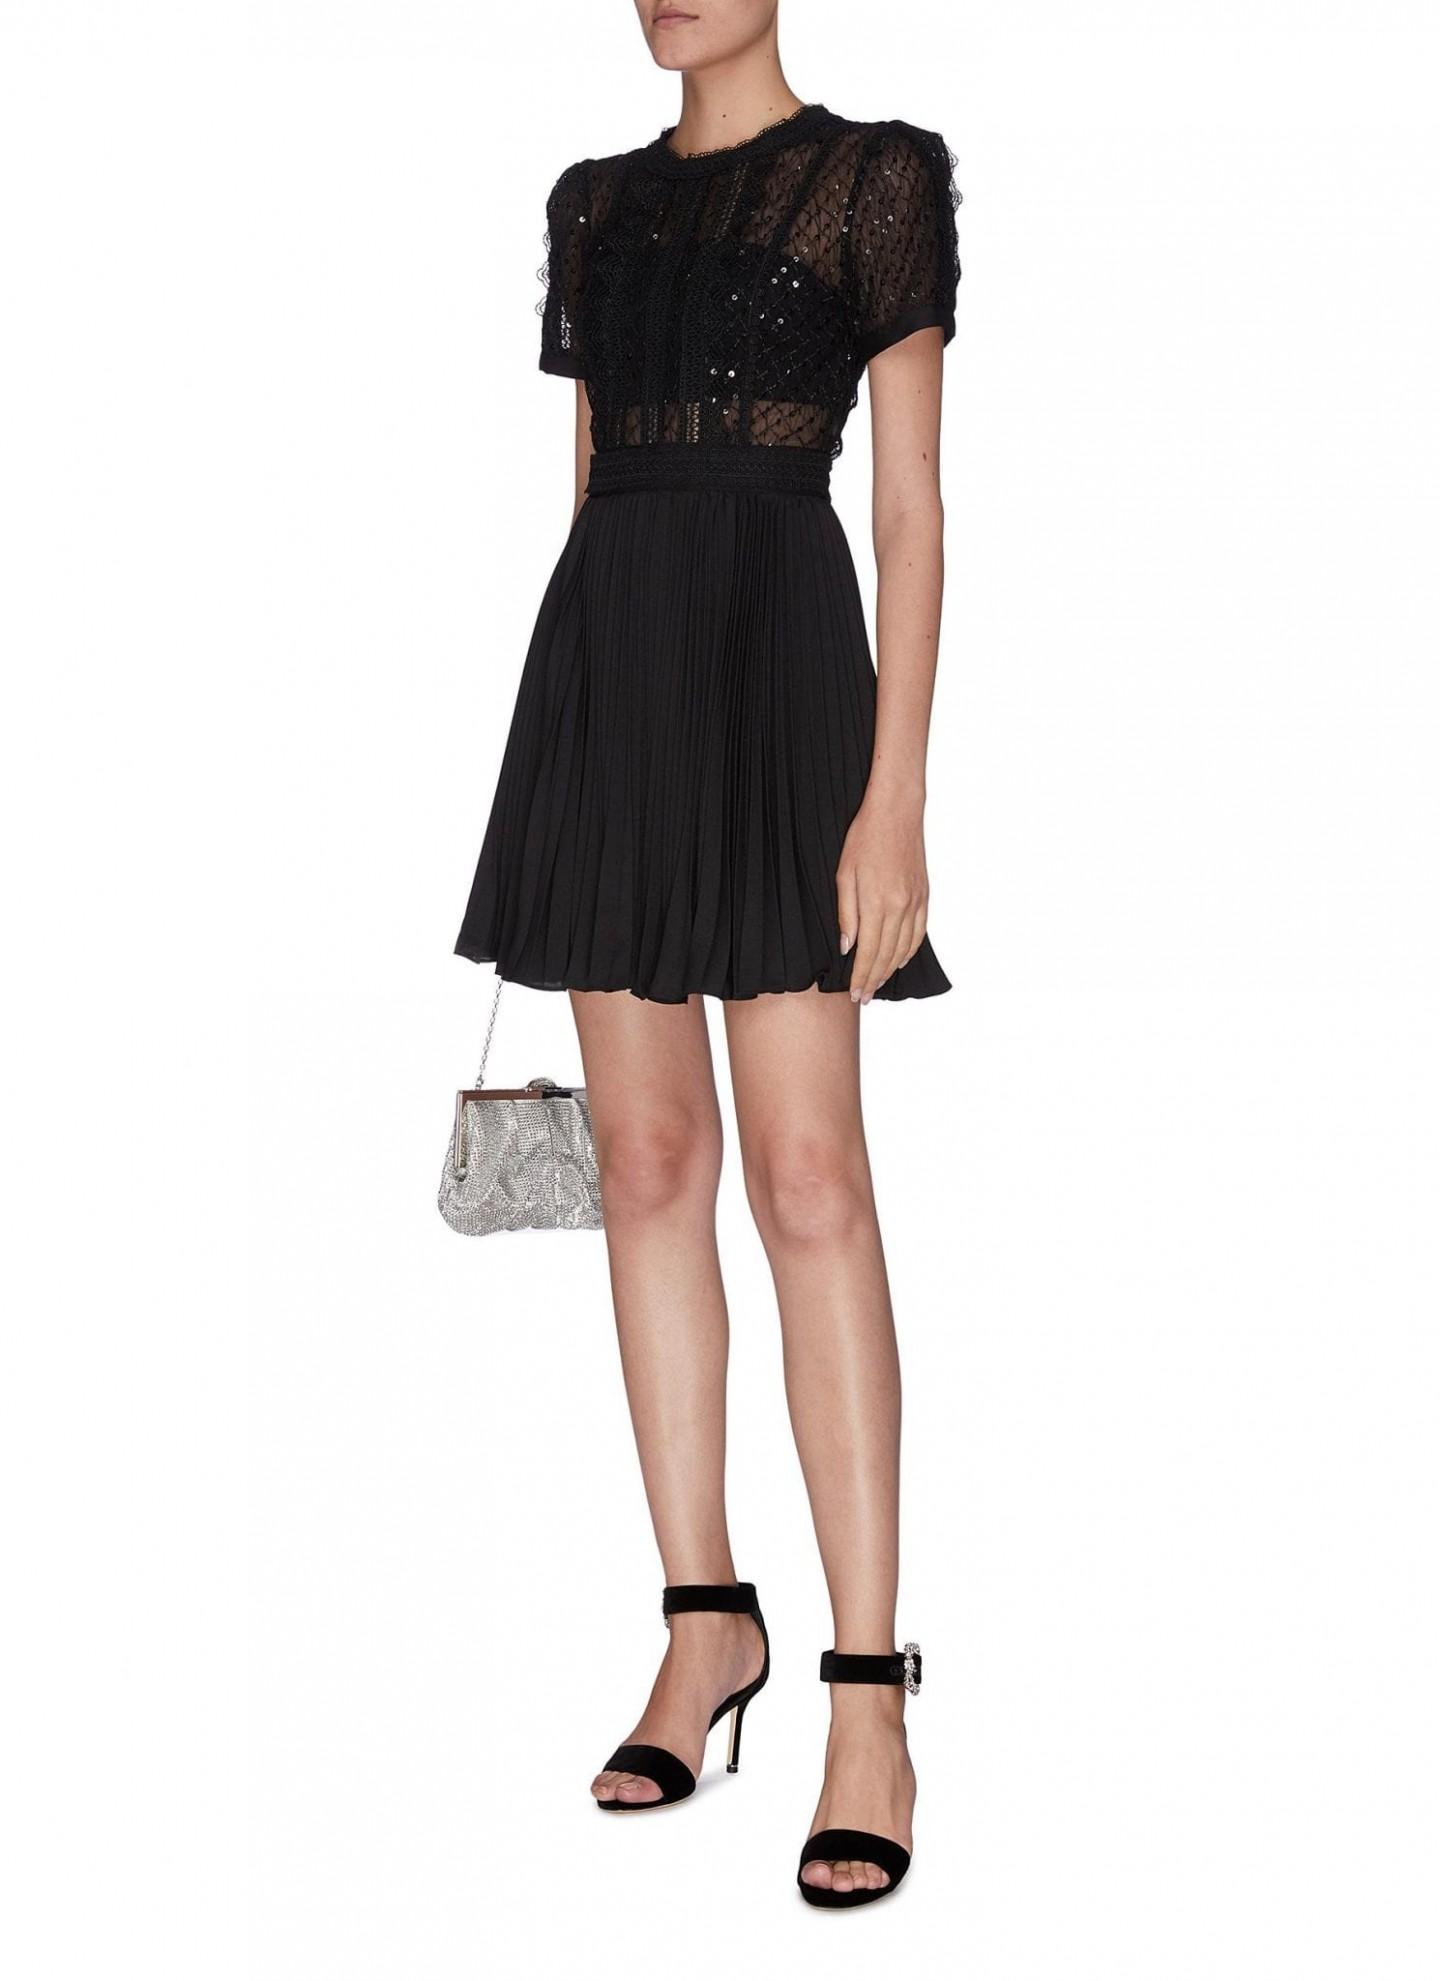 SELF-PORTRAIT Sequin Mesh Panel Puff Sleeve Mini Dress